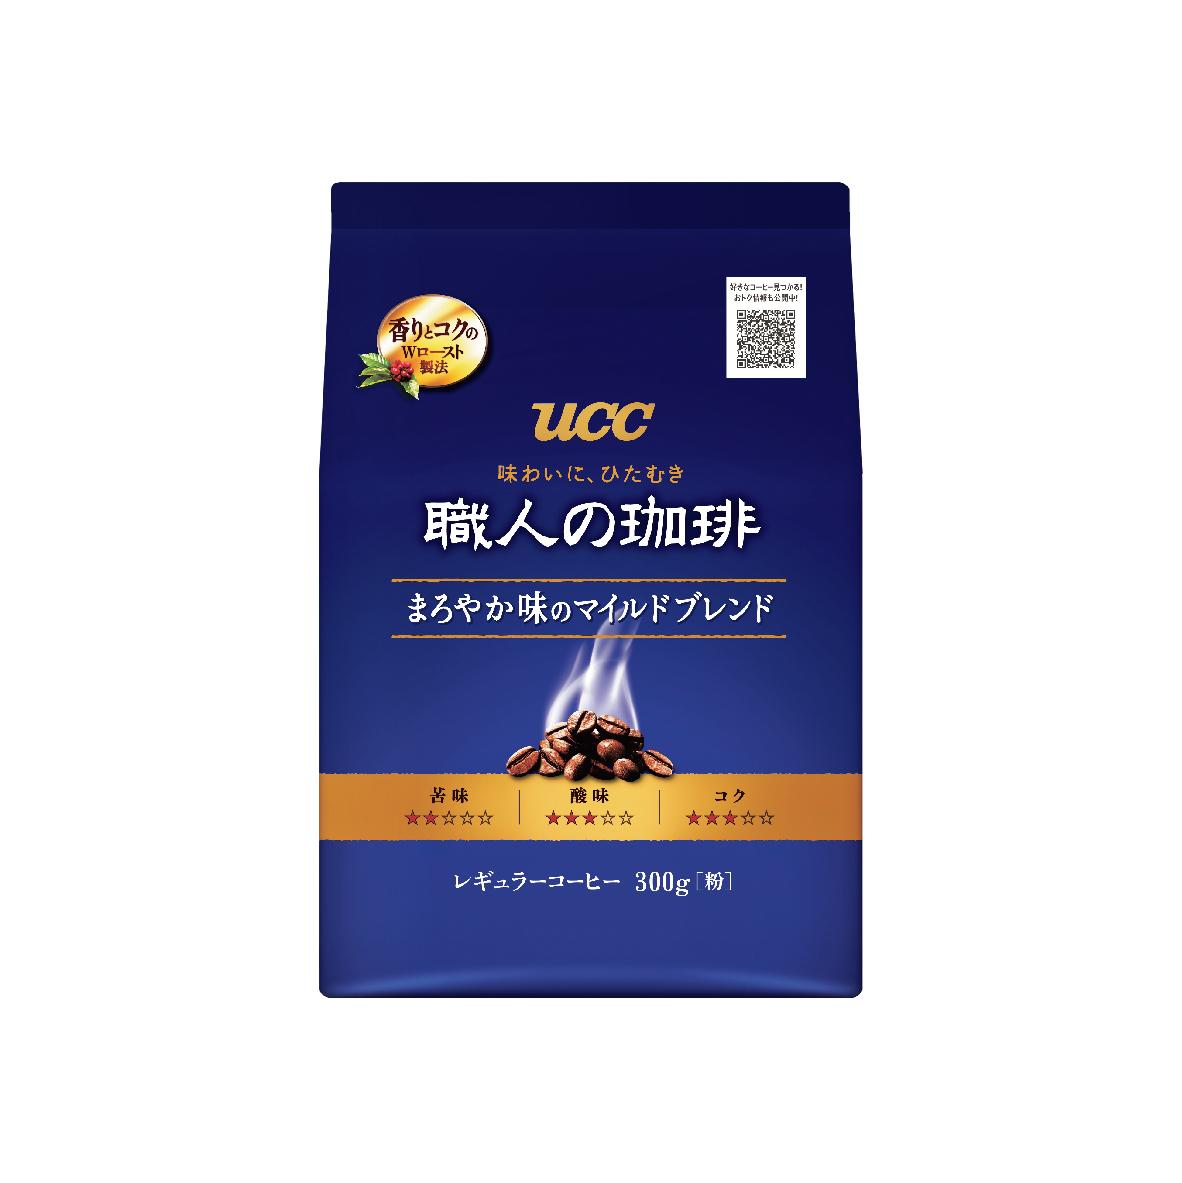 UCC Craftsman's Coffee Mild Roasted Coffee